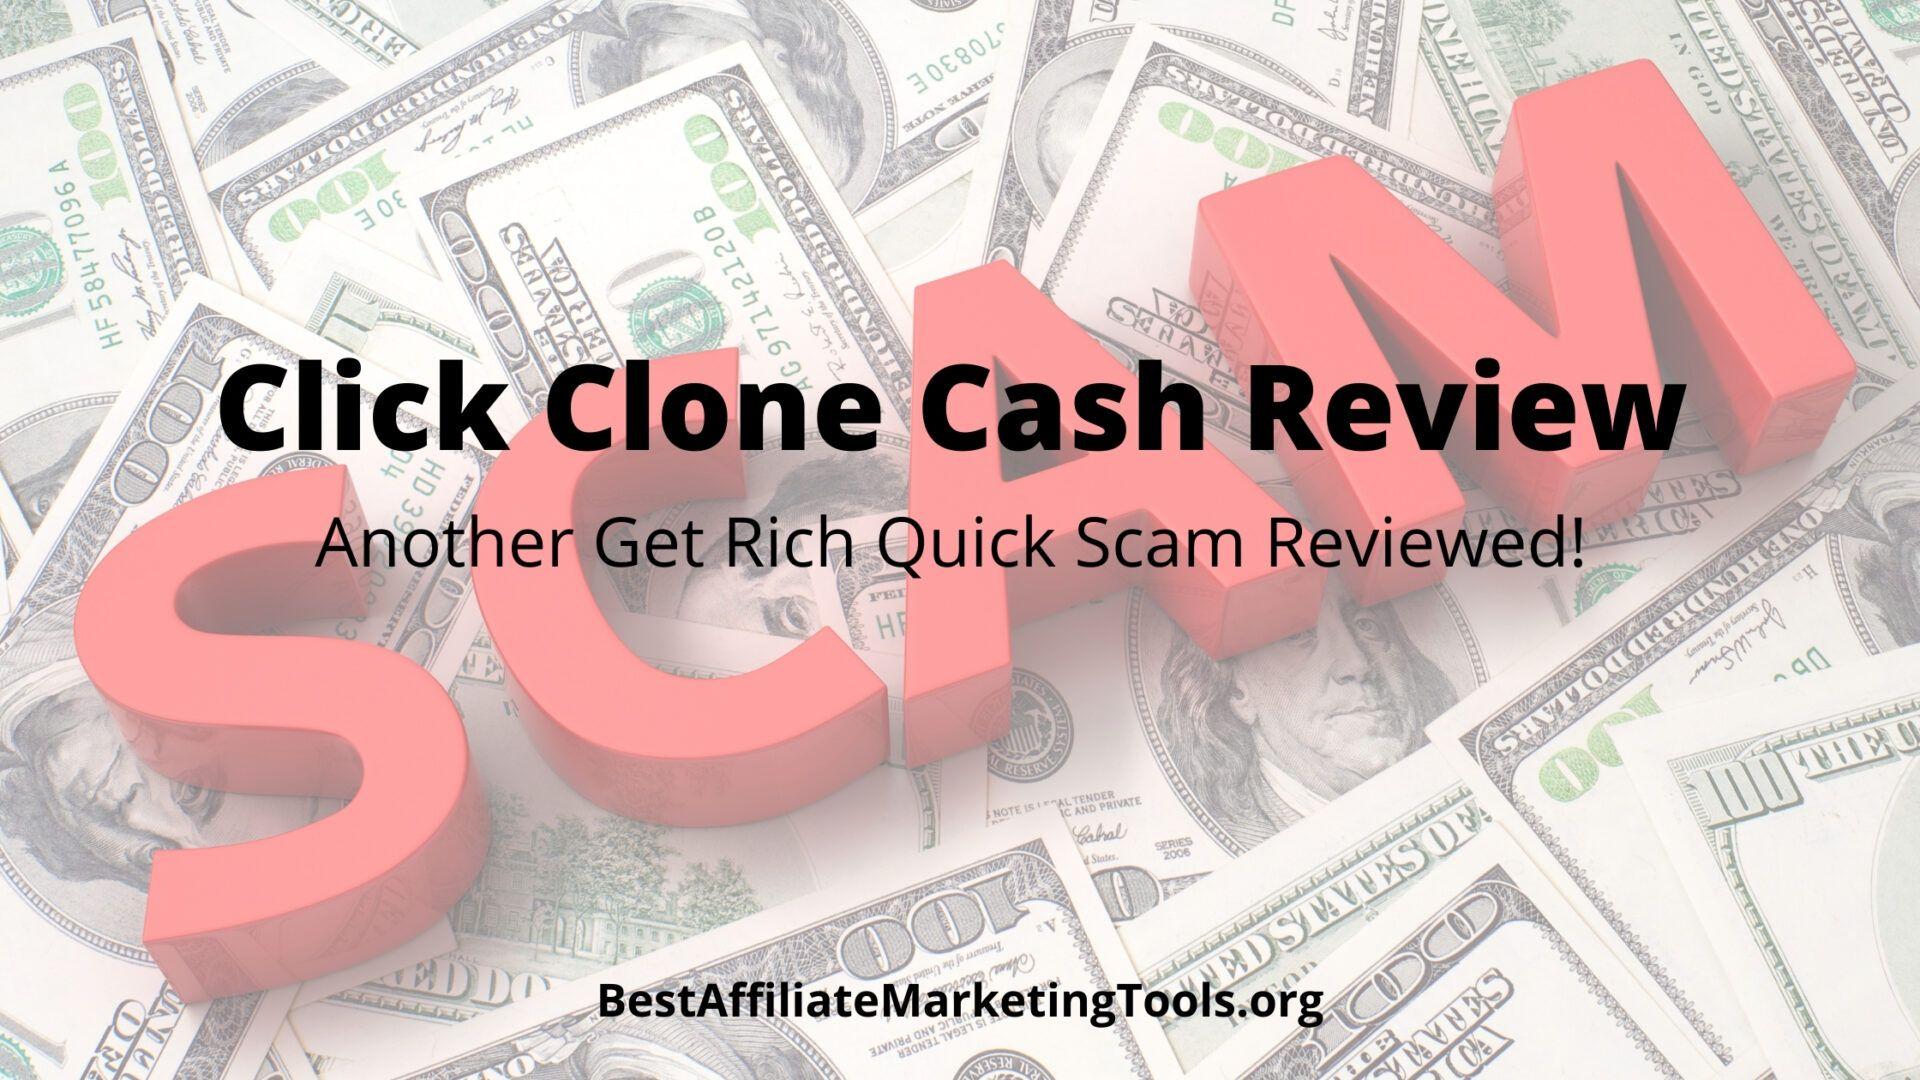 Click Clone Cash Review